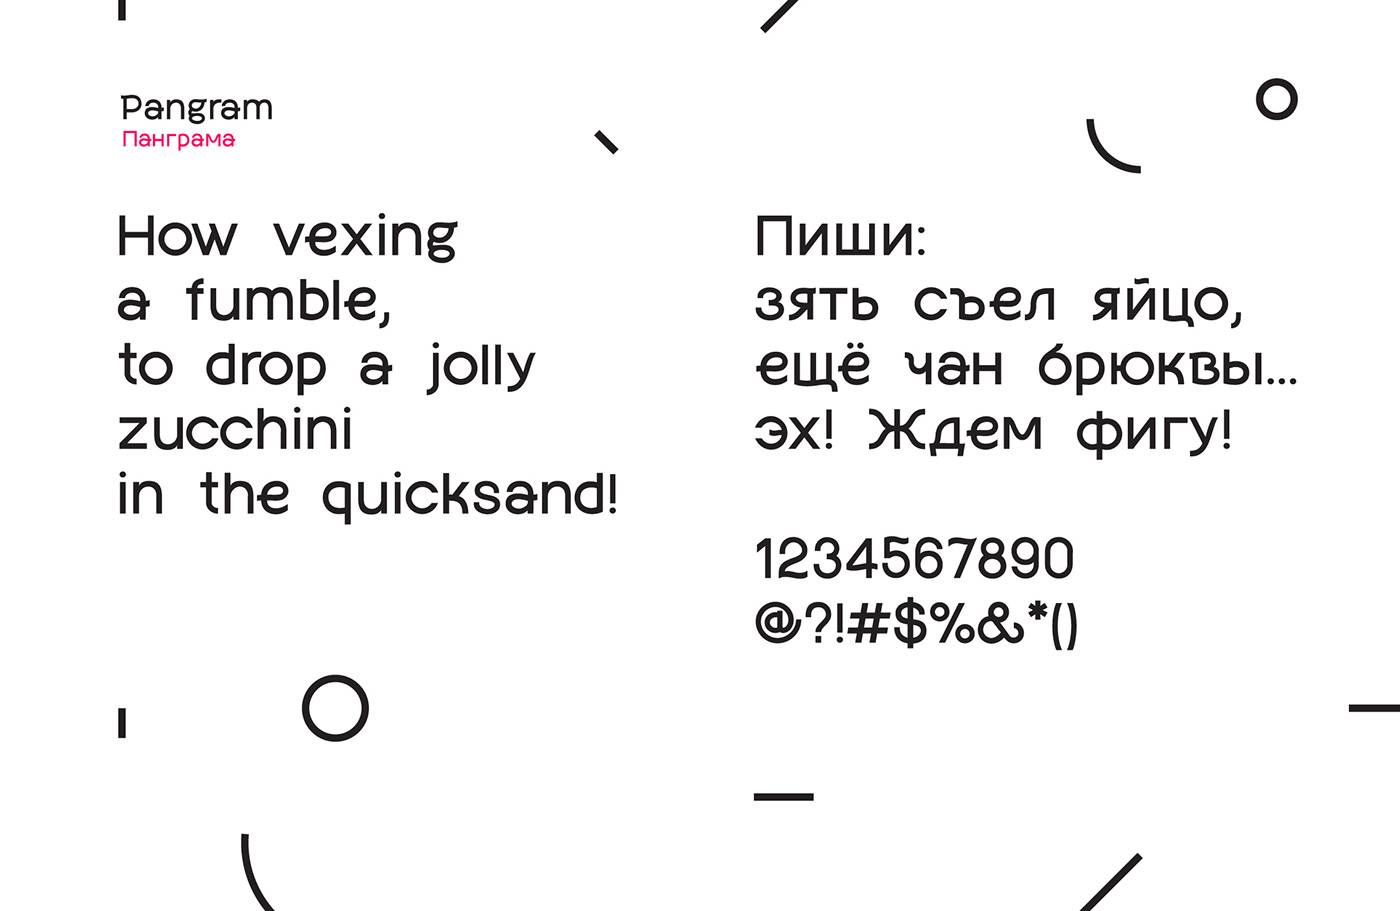 865cbc53708529.59464b68c31f2